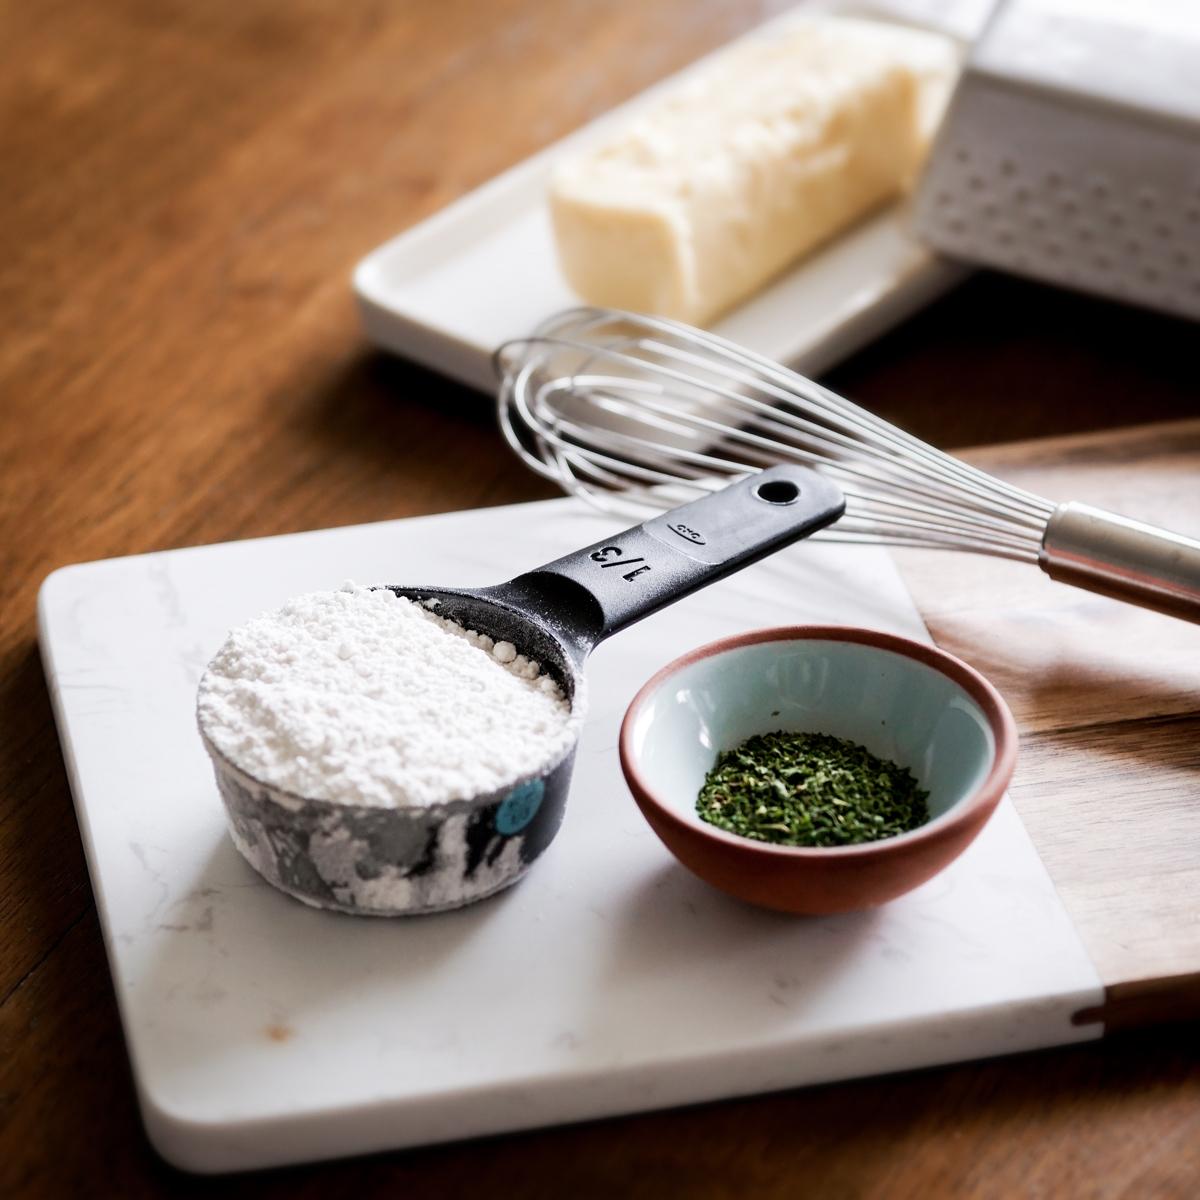 http://blog.bestbuy.ca/wp-content/uploads/2020/10/Swedish-meatballs-with-gravy-and-pasta-2.jpg